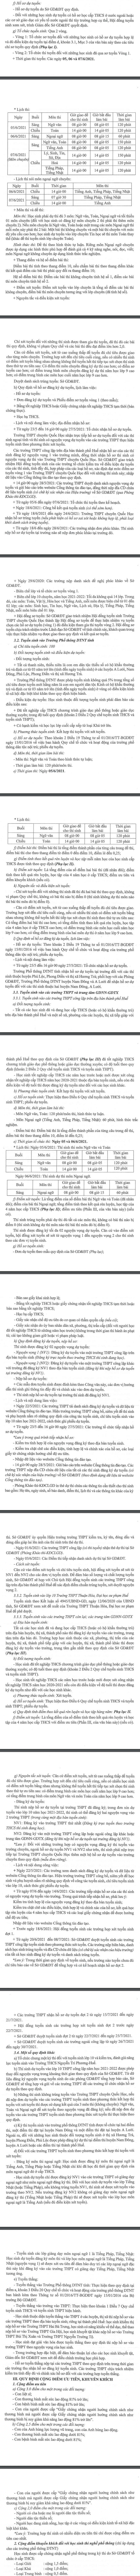 Ke hoach tuyen sinh vao lop 10 Thua Thien Hue 2021